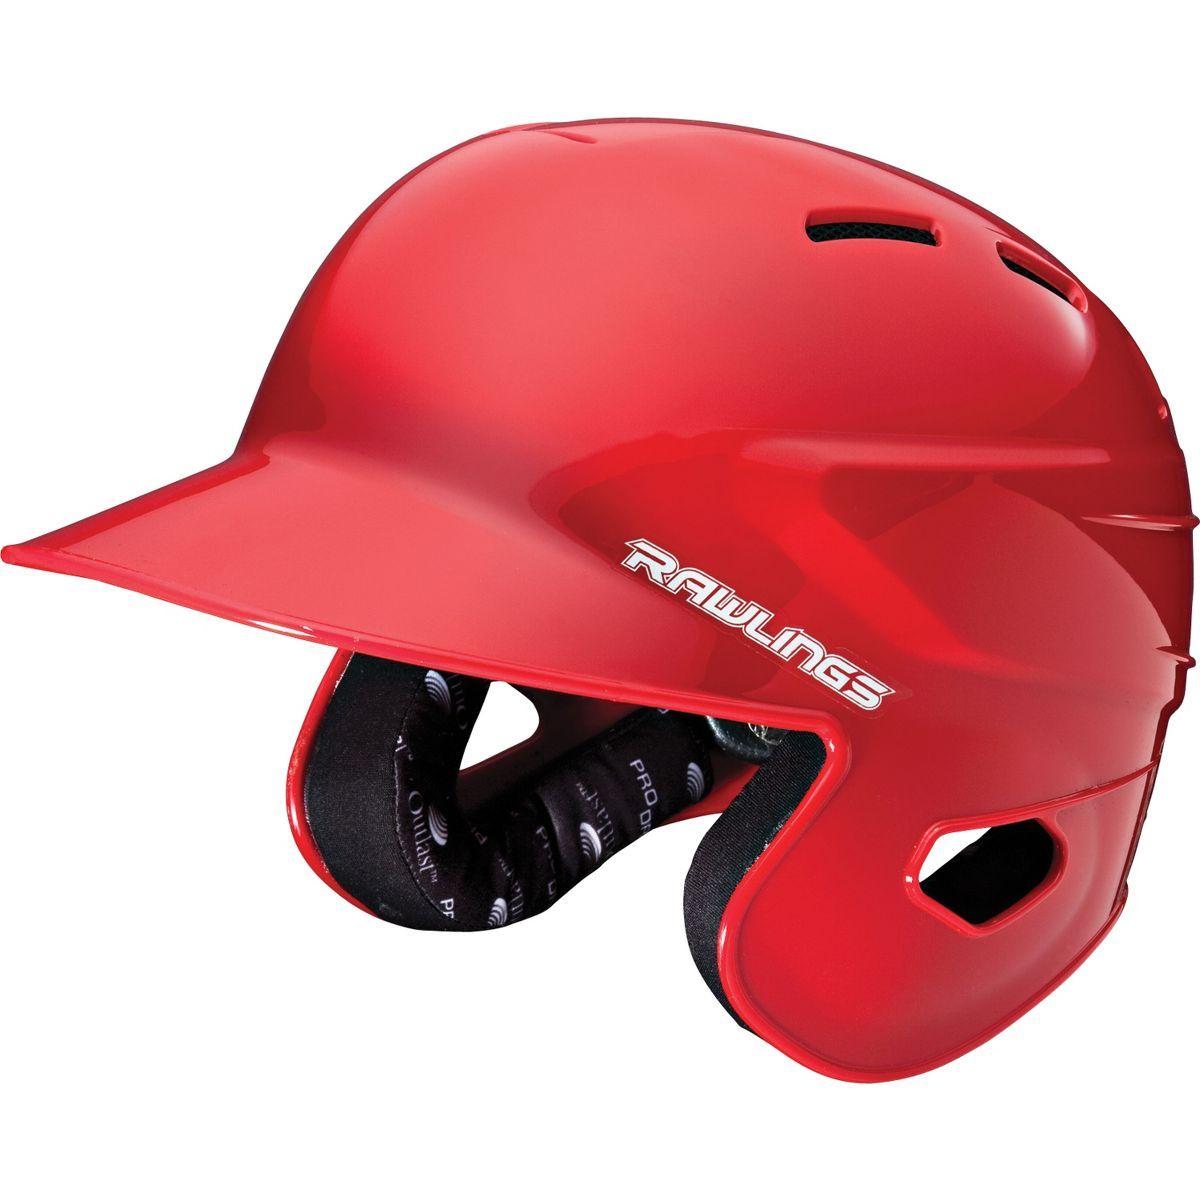 Rawlings Adult 100 Mph Safety Batting Helmet Batting Helmet Helmet Baseball Helmet